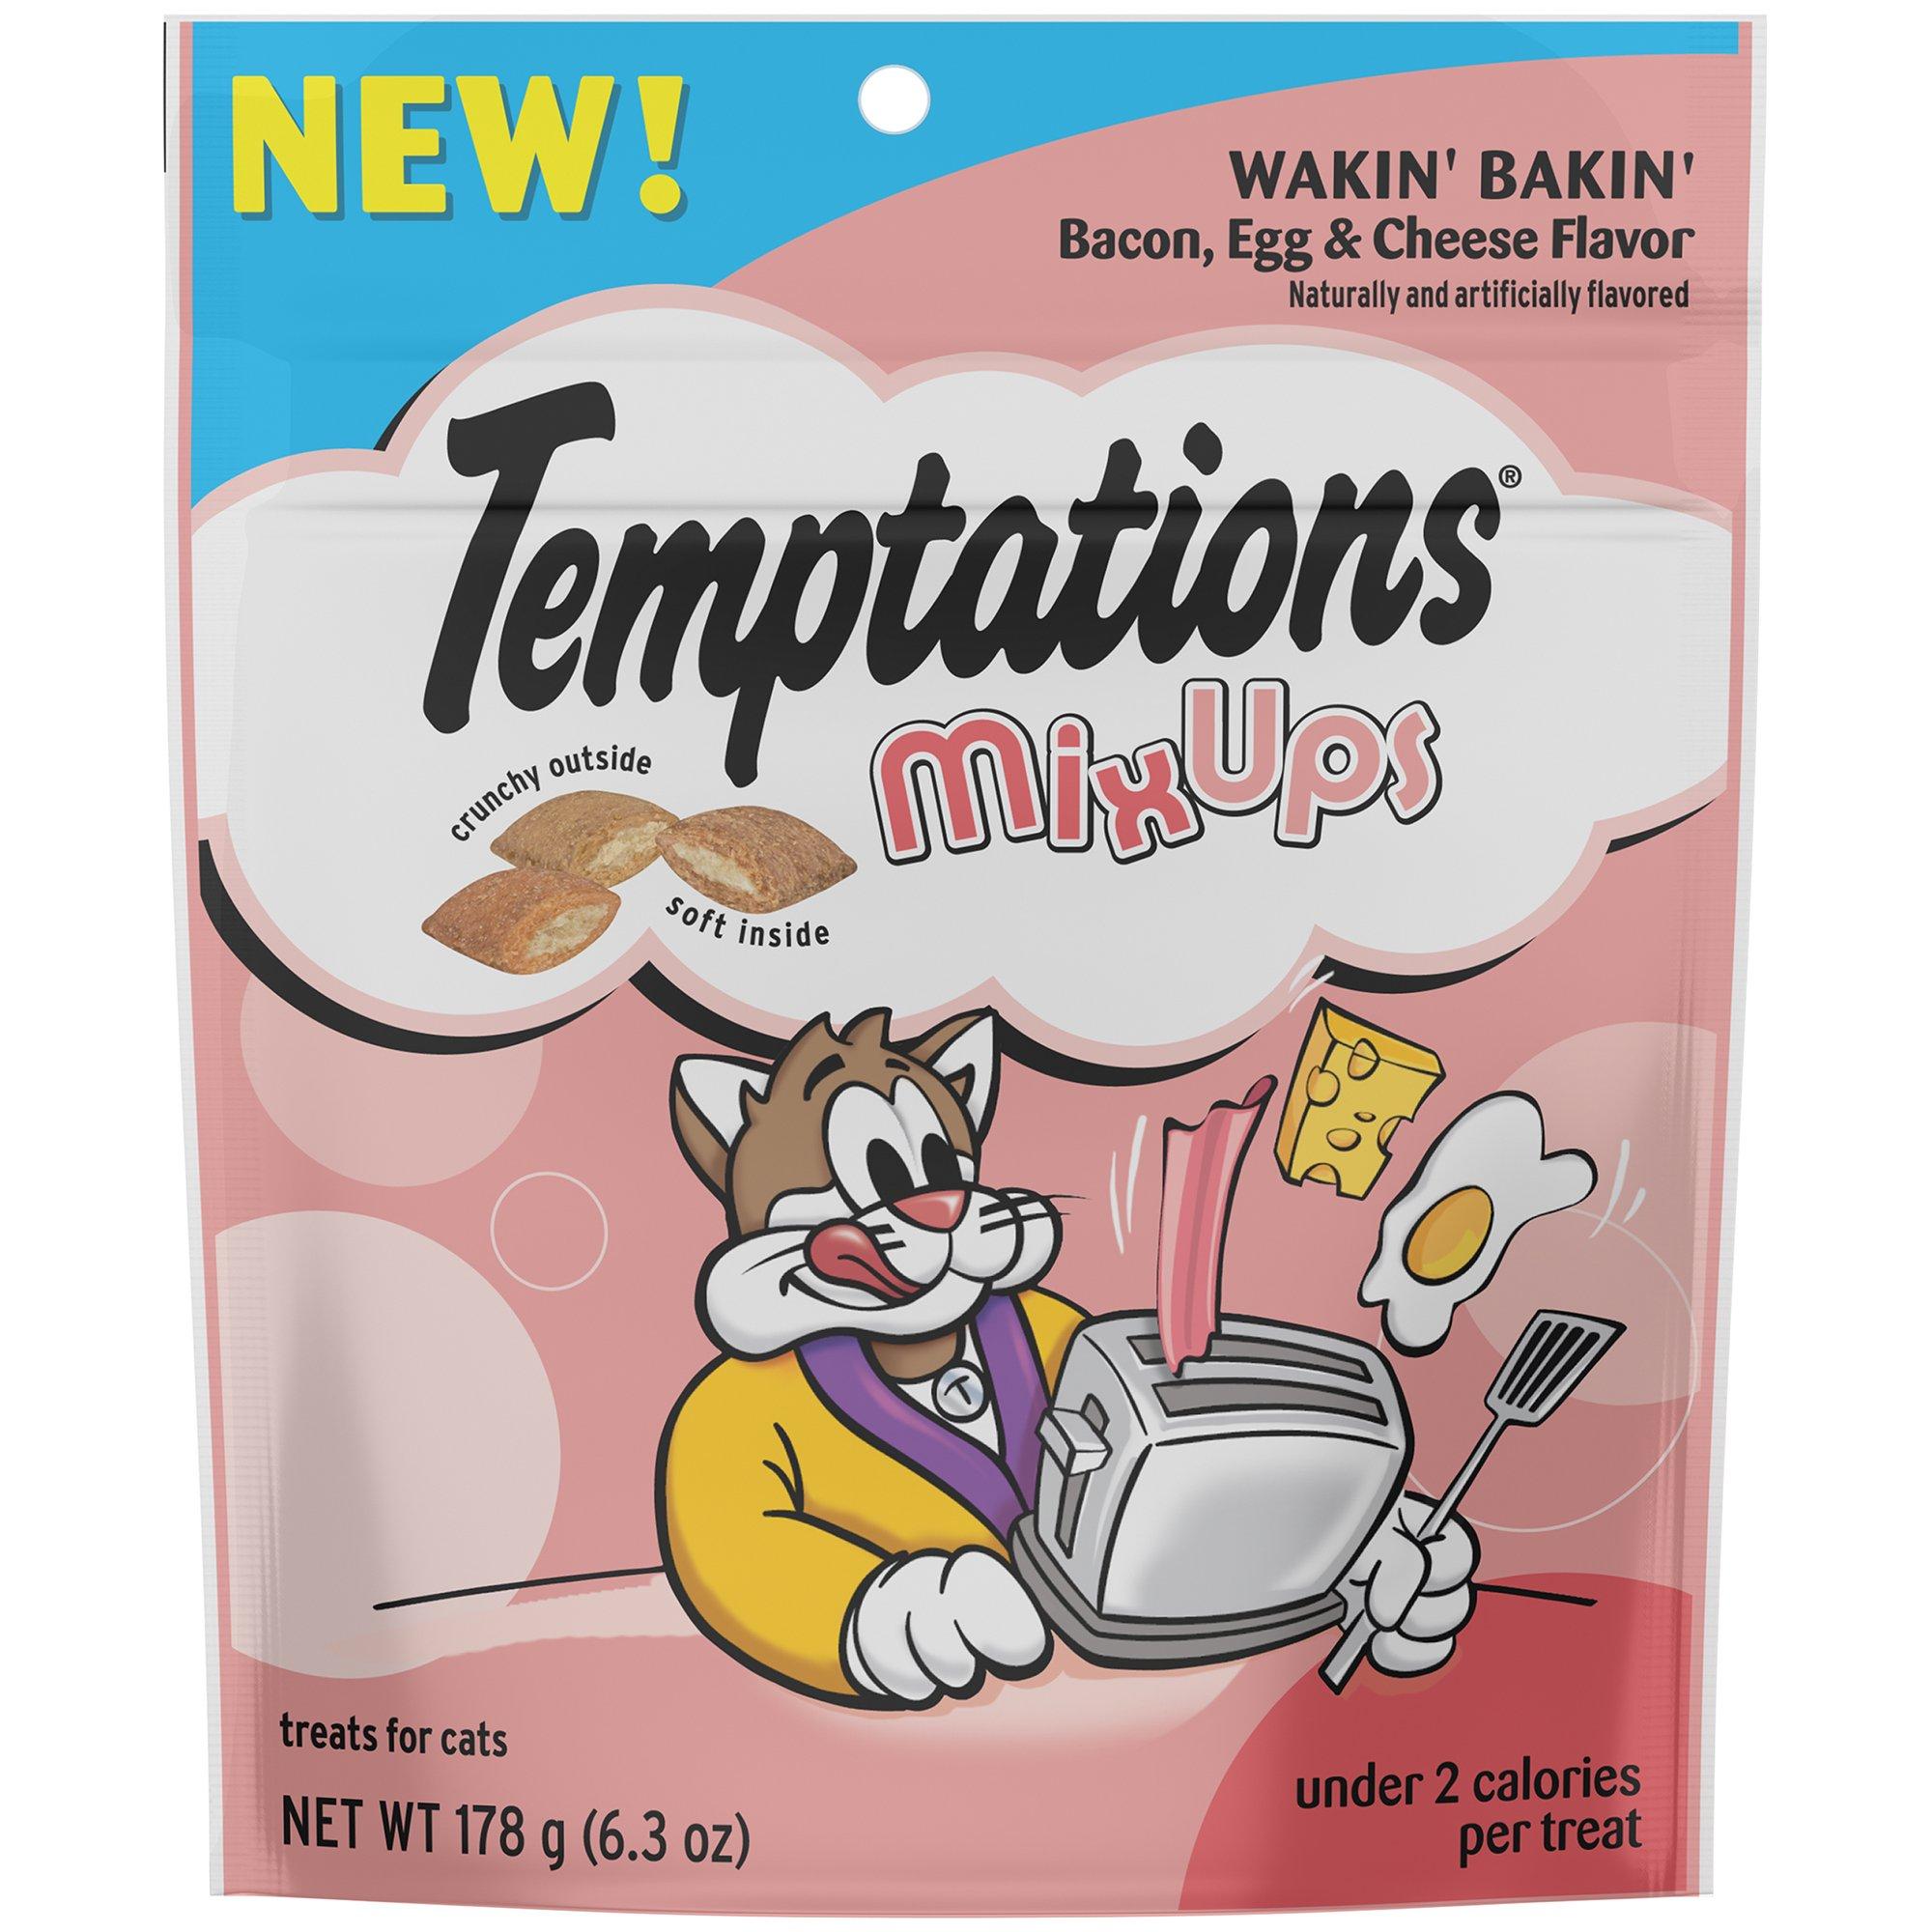 TEMPTATIONS Mega MixUps Treats for Cats Wakin' Bakin' Flavor 6.3 Ounces (Pack of 10)